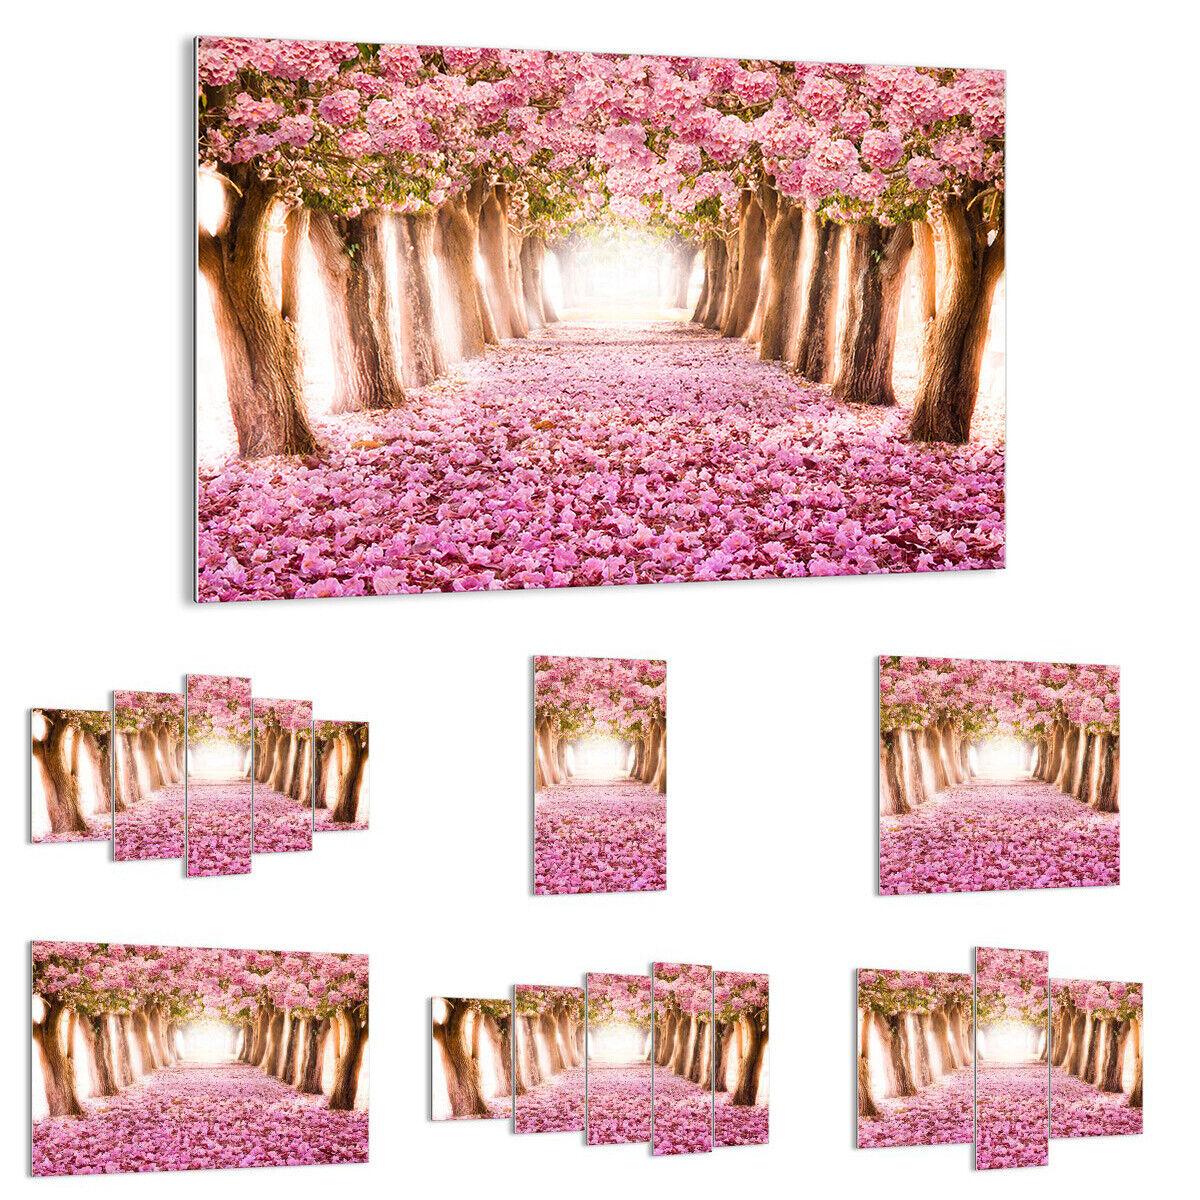 GLASS PRINTS Image Wall Art tree flowers cherry nature 2794 UK